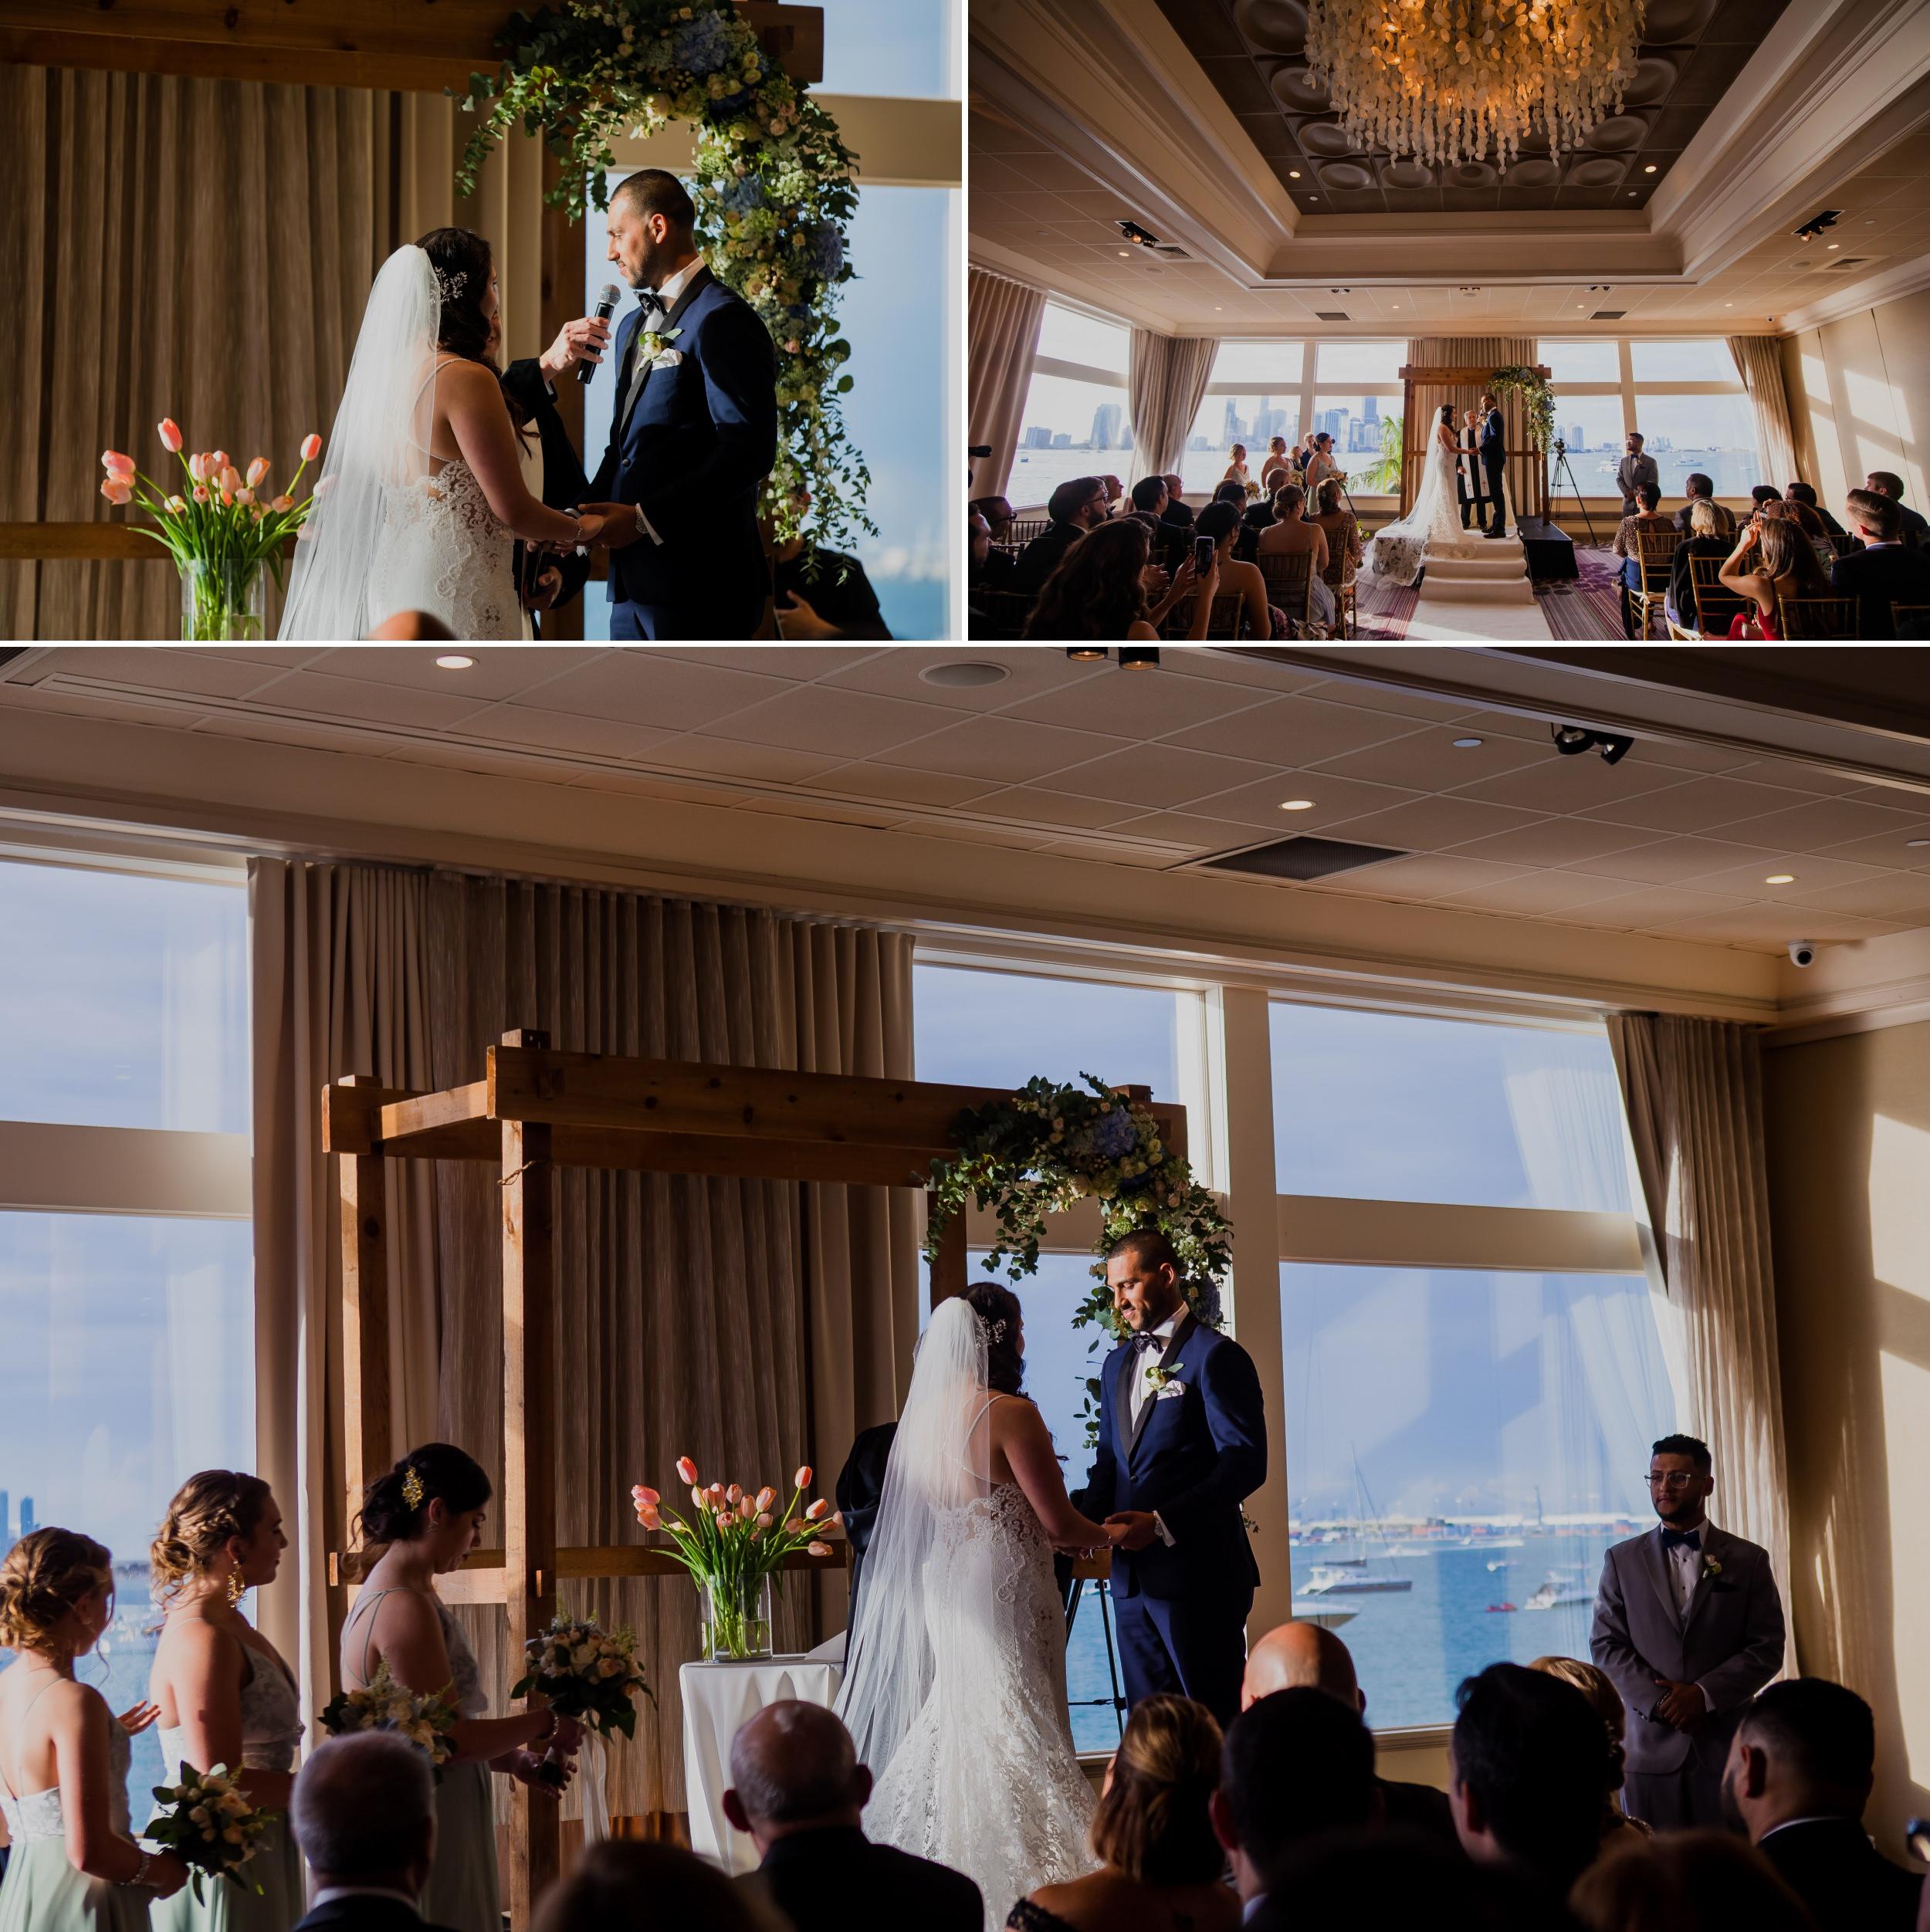 Wedding - Rusty Pelican - Key Biscayne - Santy Martinez Photography 30.jpg